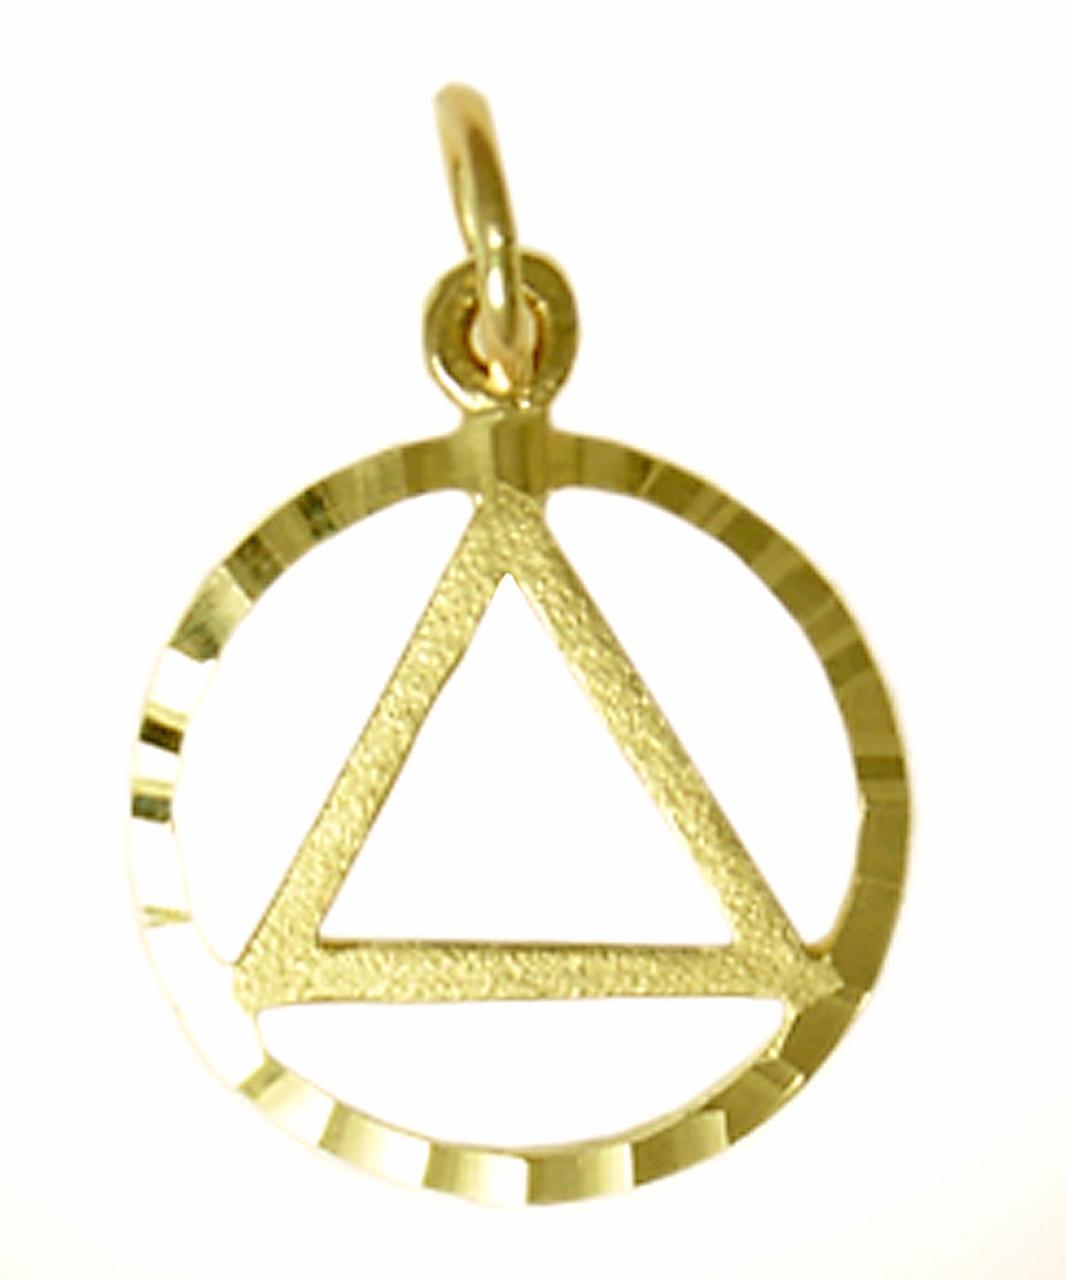 Style 577 1 14k gold pendant aa circle triangle in a diamond style 577 1 14k gold pendant aa circle triangle in a diamond buycottarizona